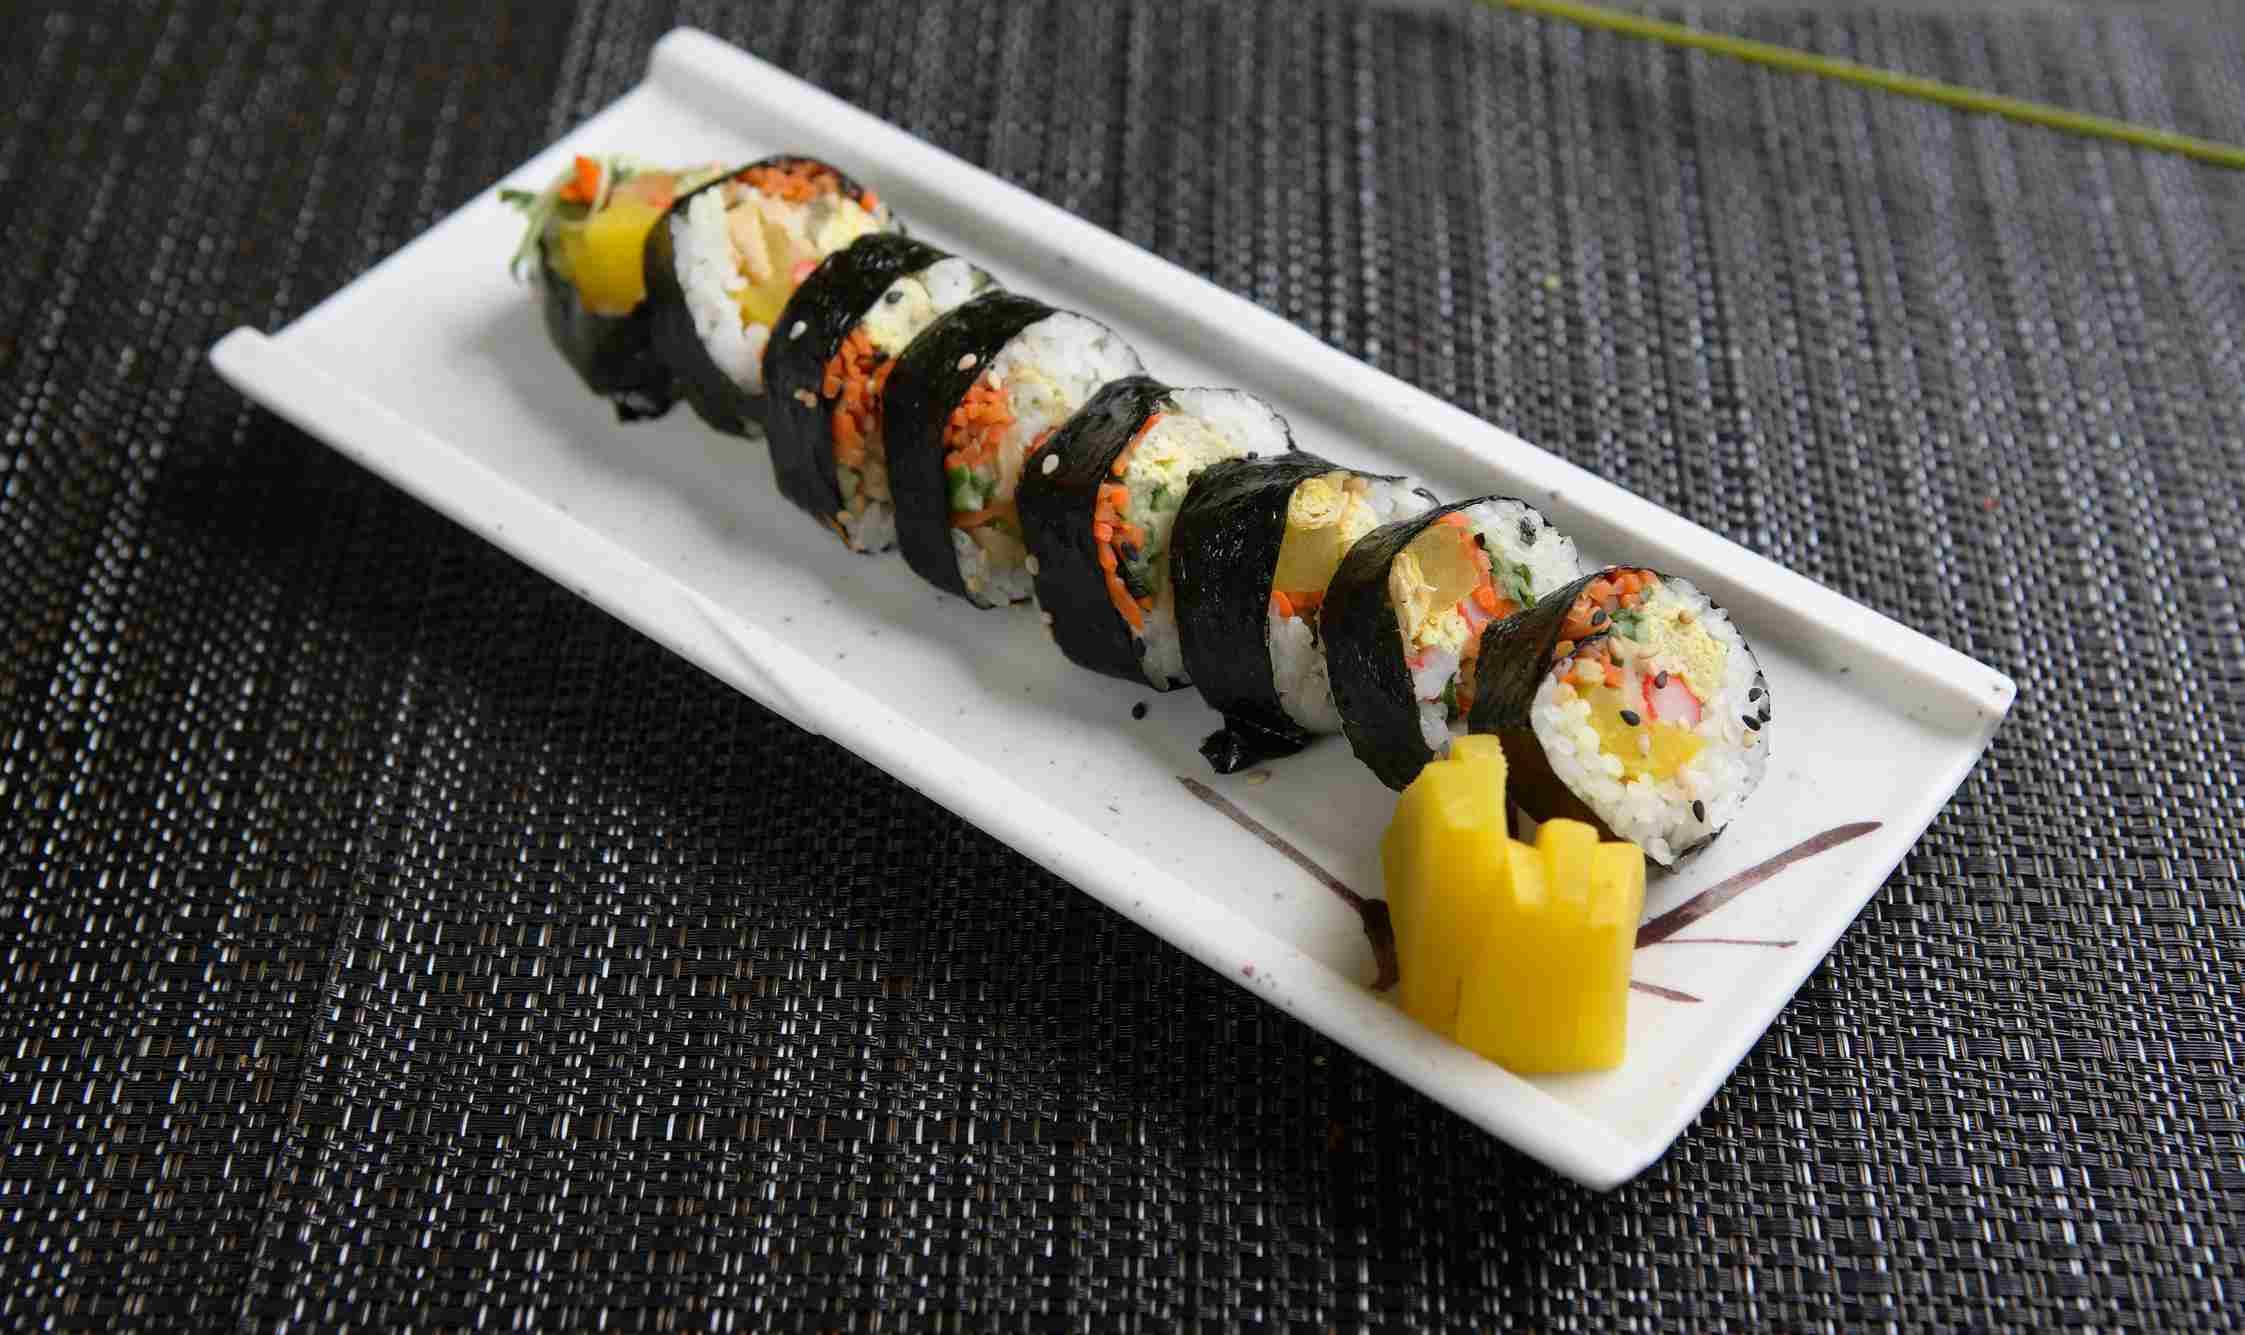 Kimbap rolls on dish